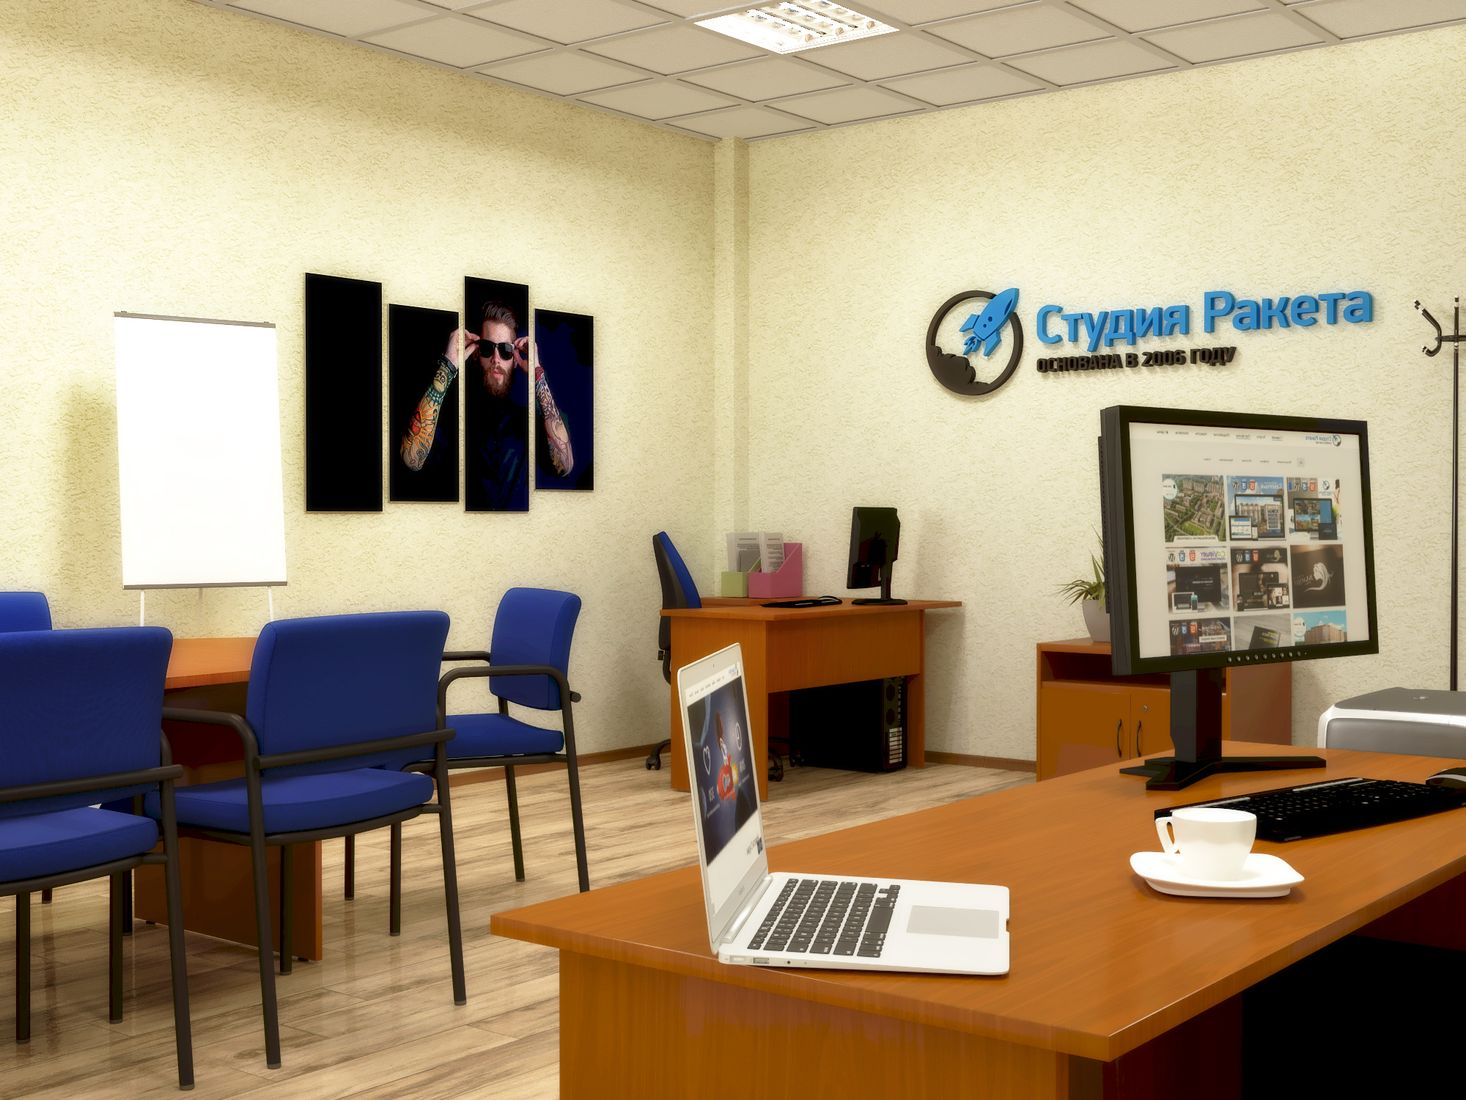 Студия Ракета переехала в новый офис! | Студия Ракета